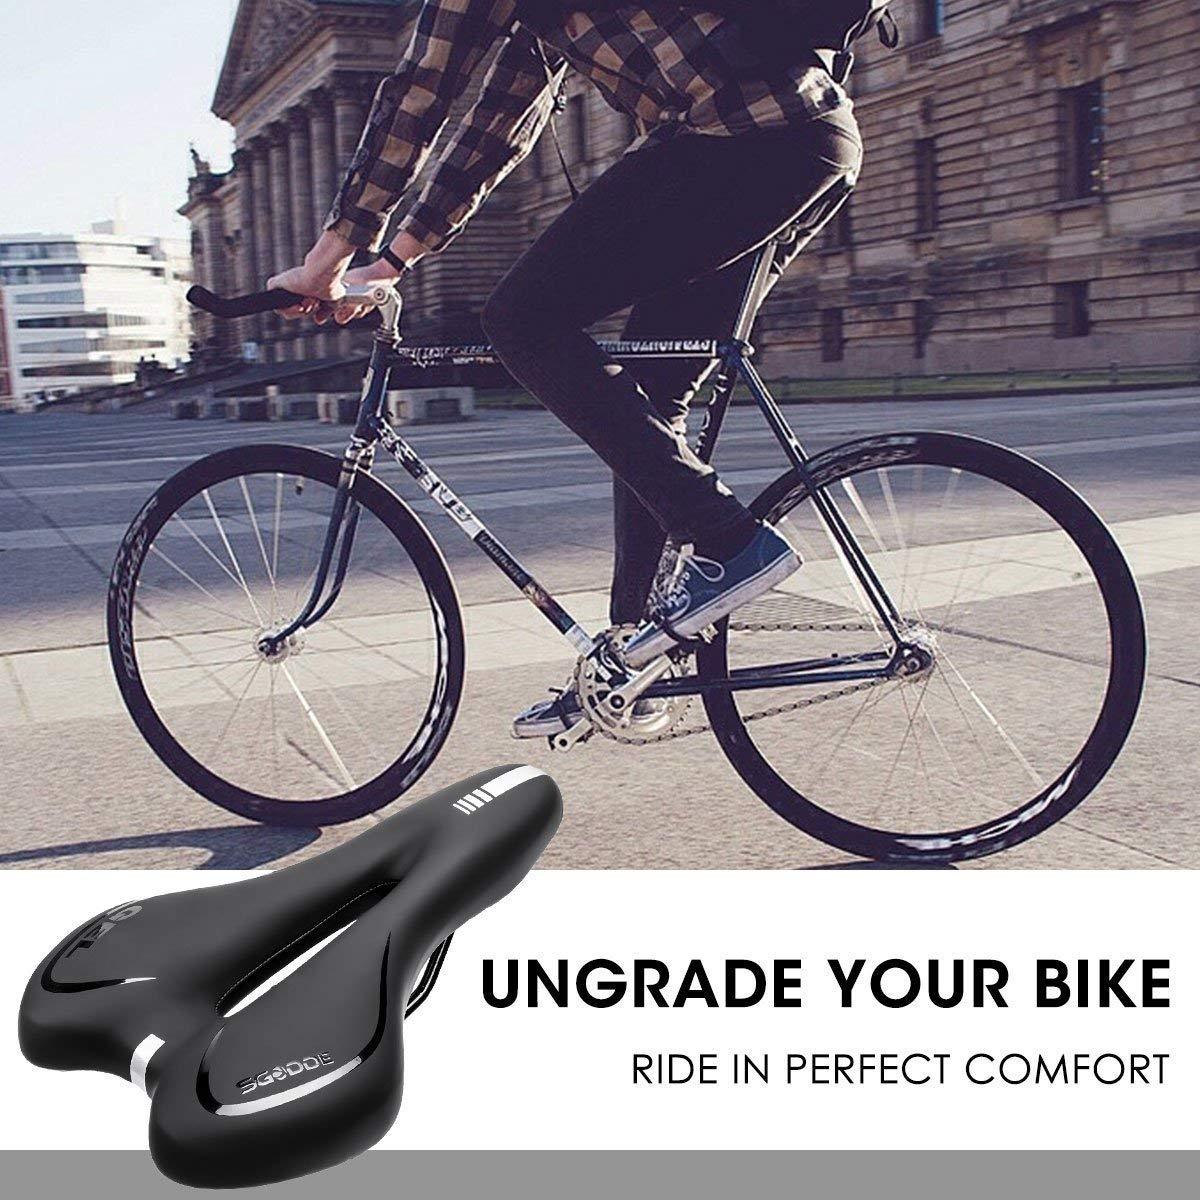 Schwarz Hohl Ergonomisch Fahrradsitz Sgodde Unisex Adult Gel Fahrrad Sattel